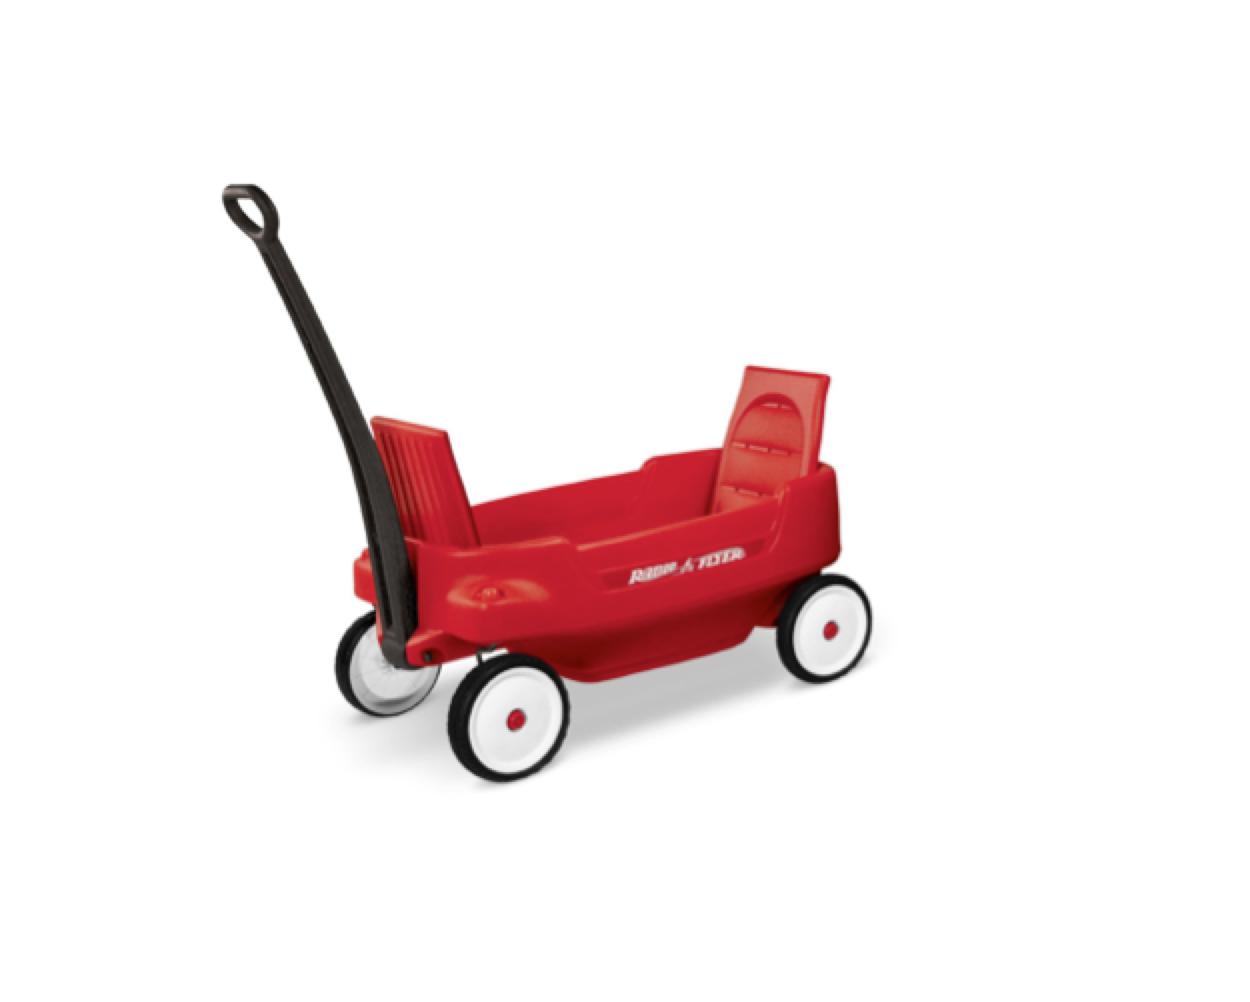 Kid's Wagon Rental  service in 30A, South Walton, Destin, Okaloosa Island, and Panama City Beach, Florida